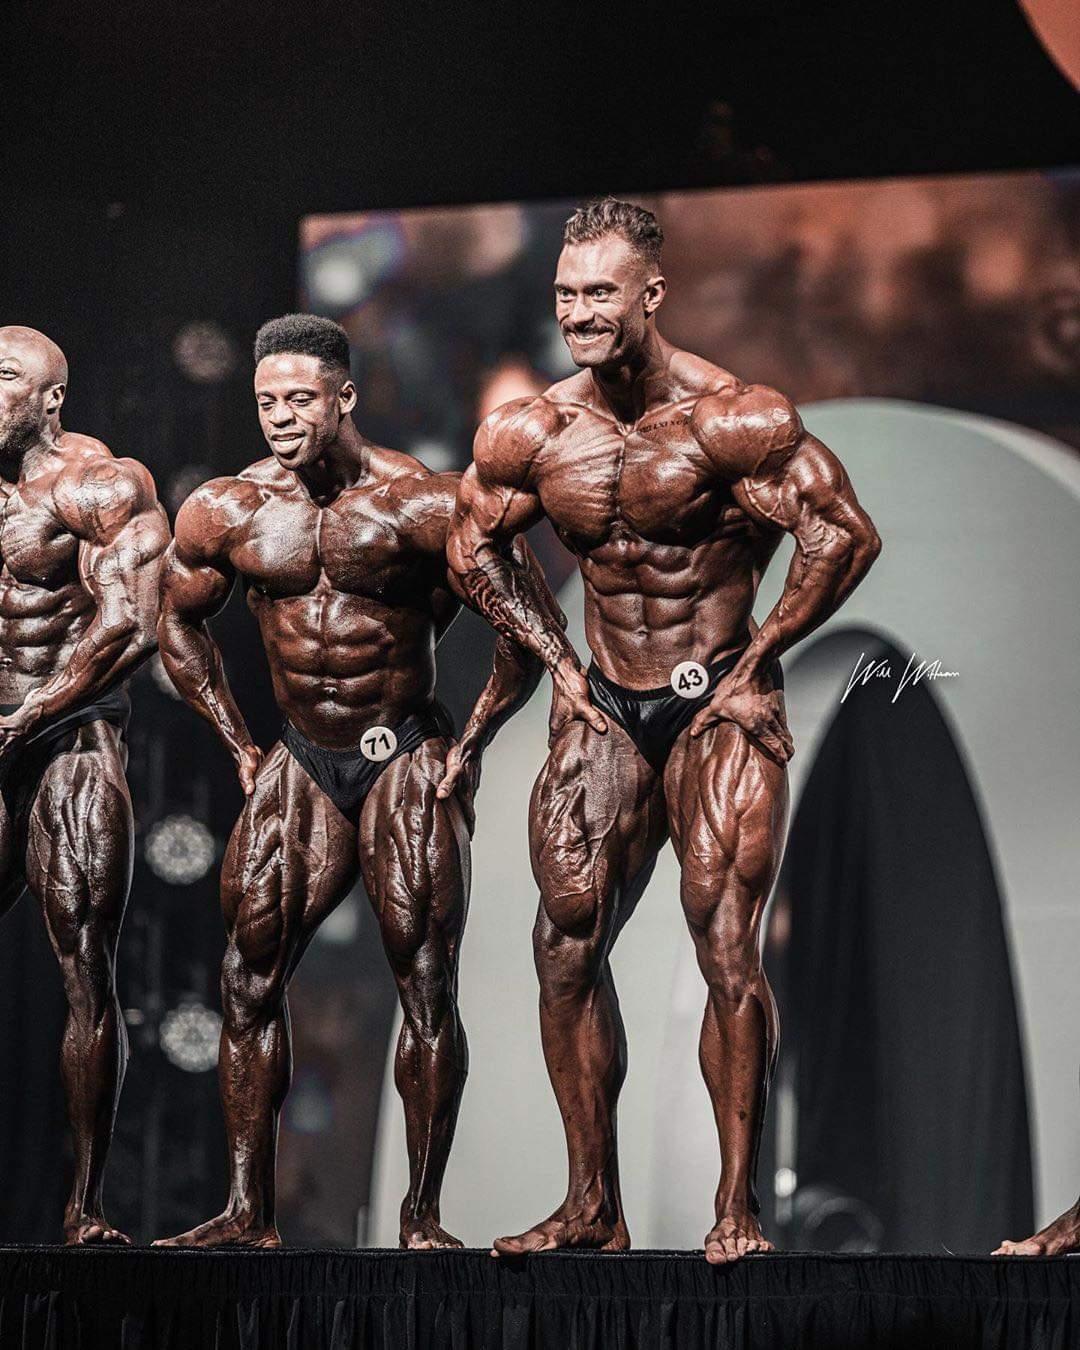 Мистер олимпия все победители. мистер олимпия 2019 и 2018 видео и описание